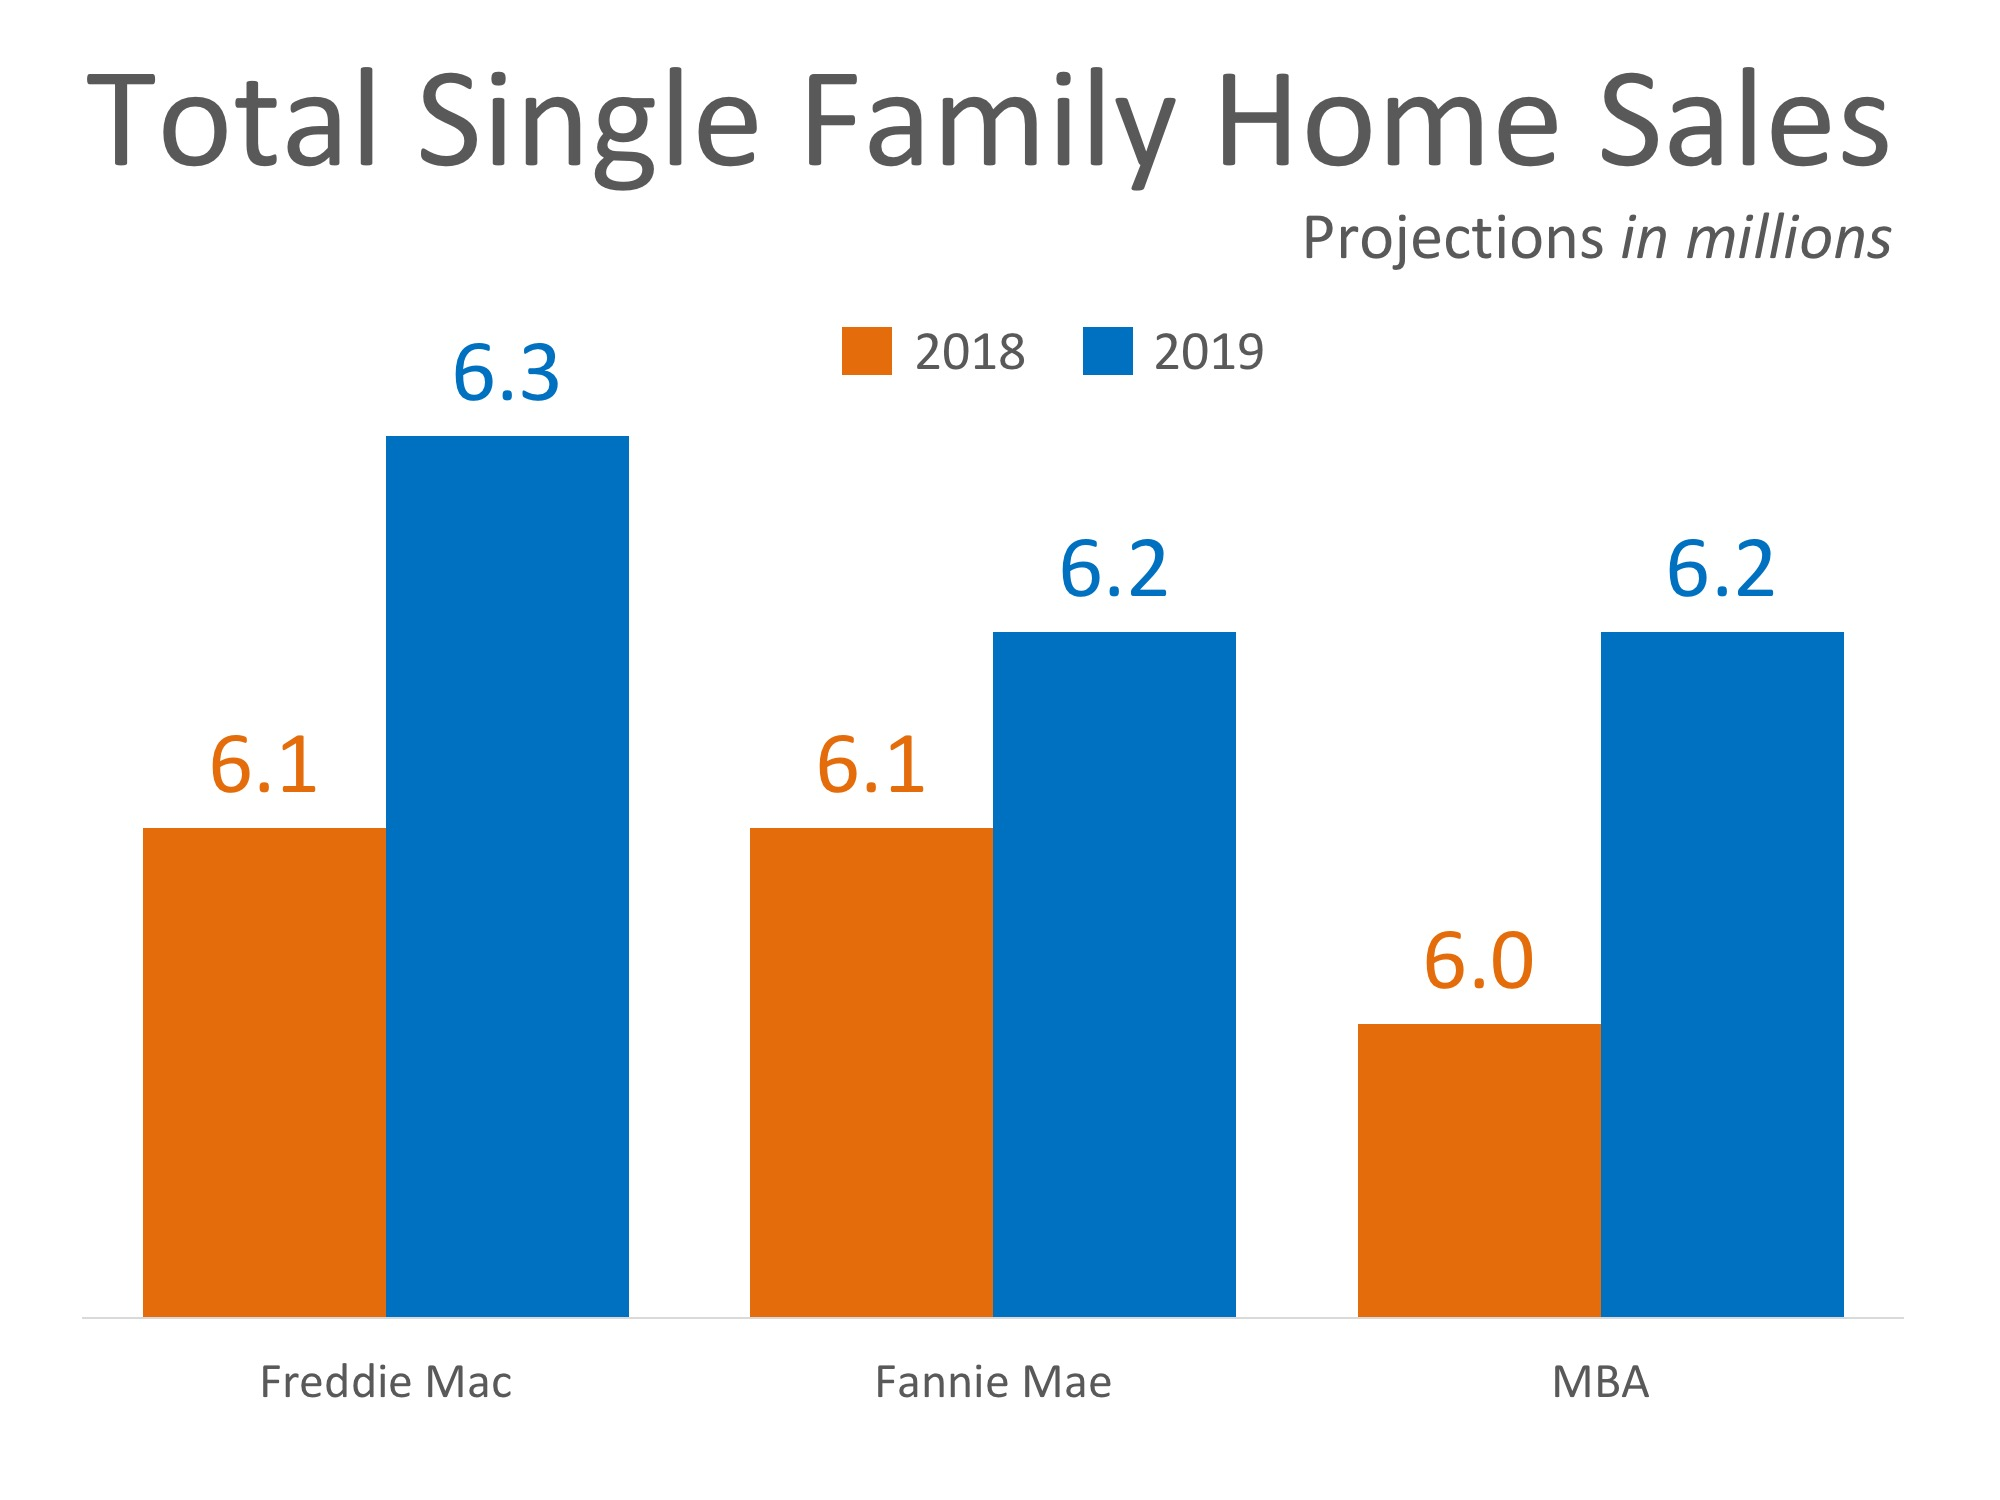 Boston condo sales will continue to increase through 2019